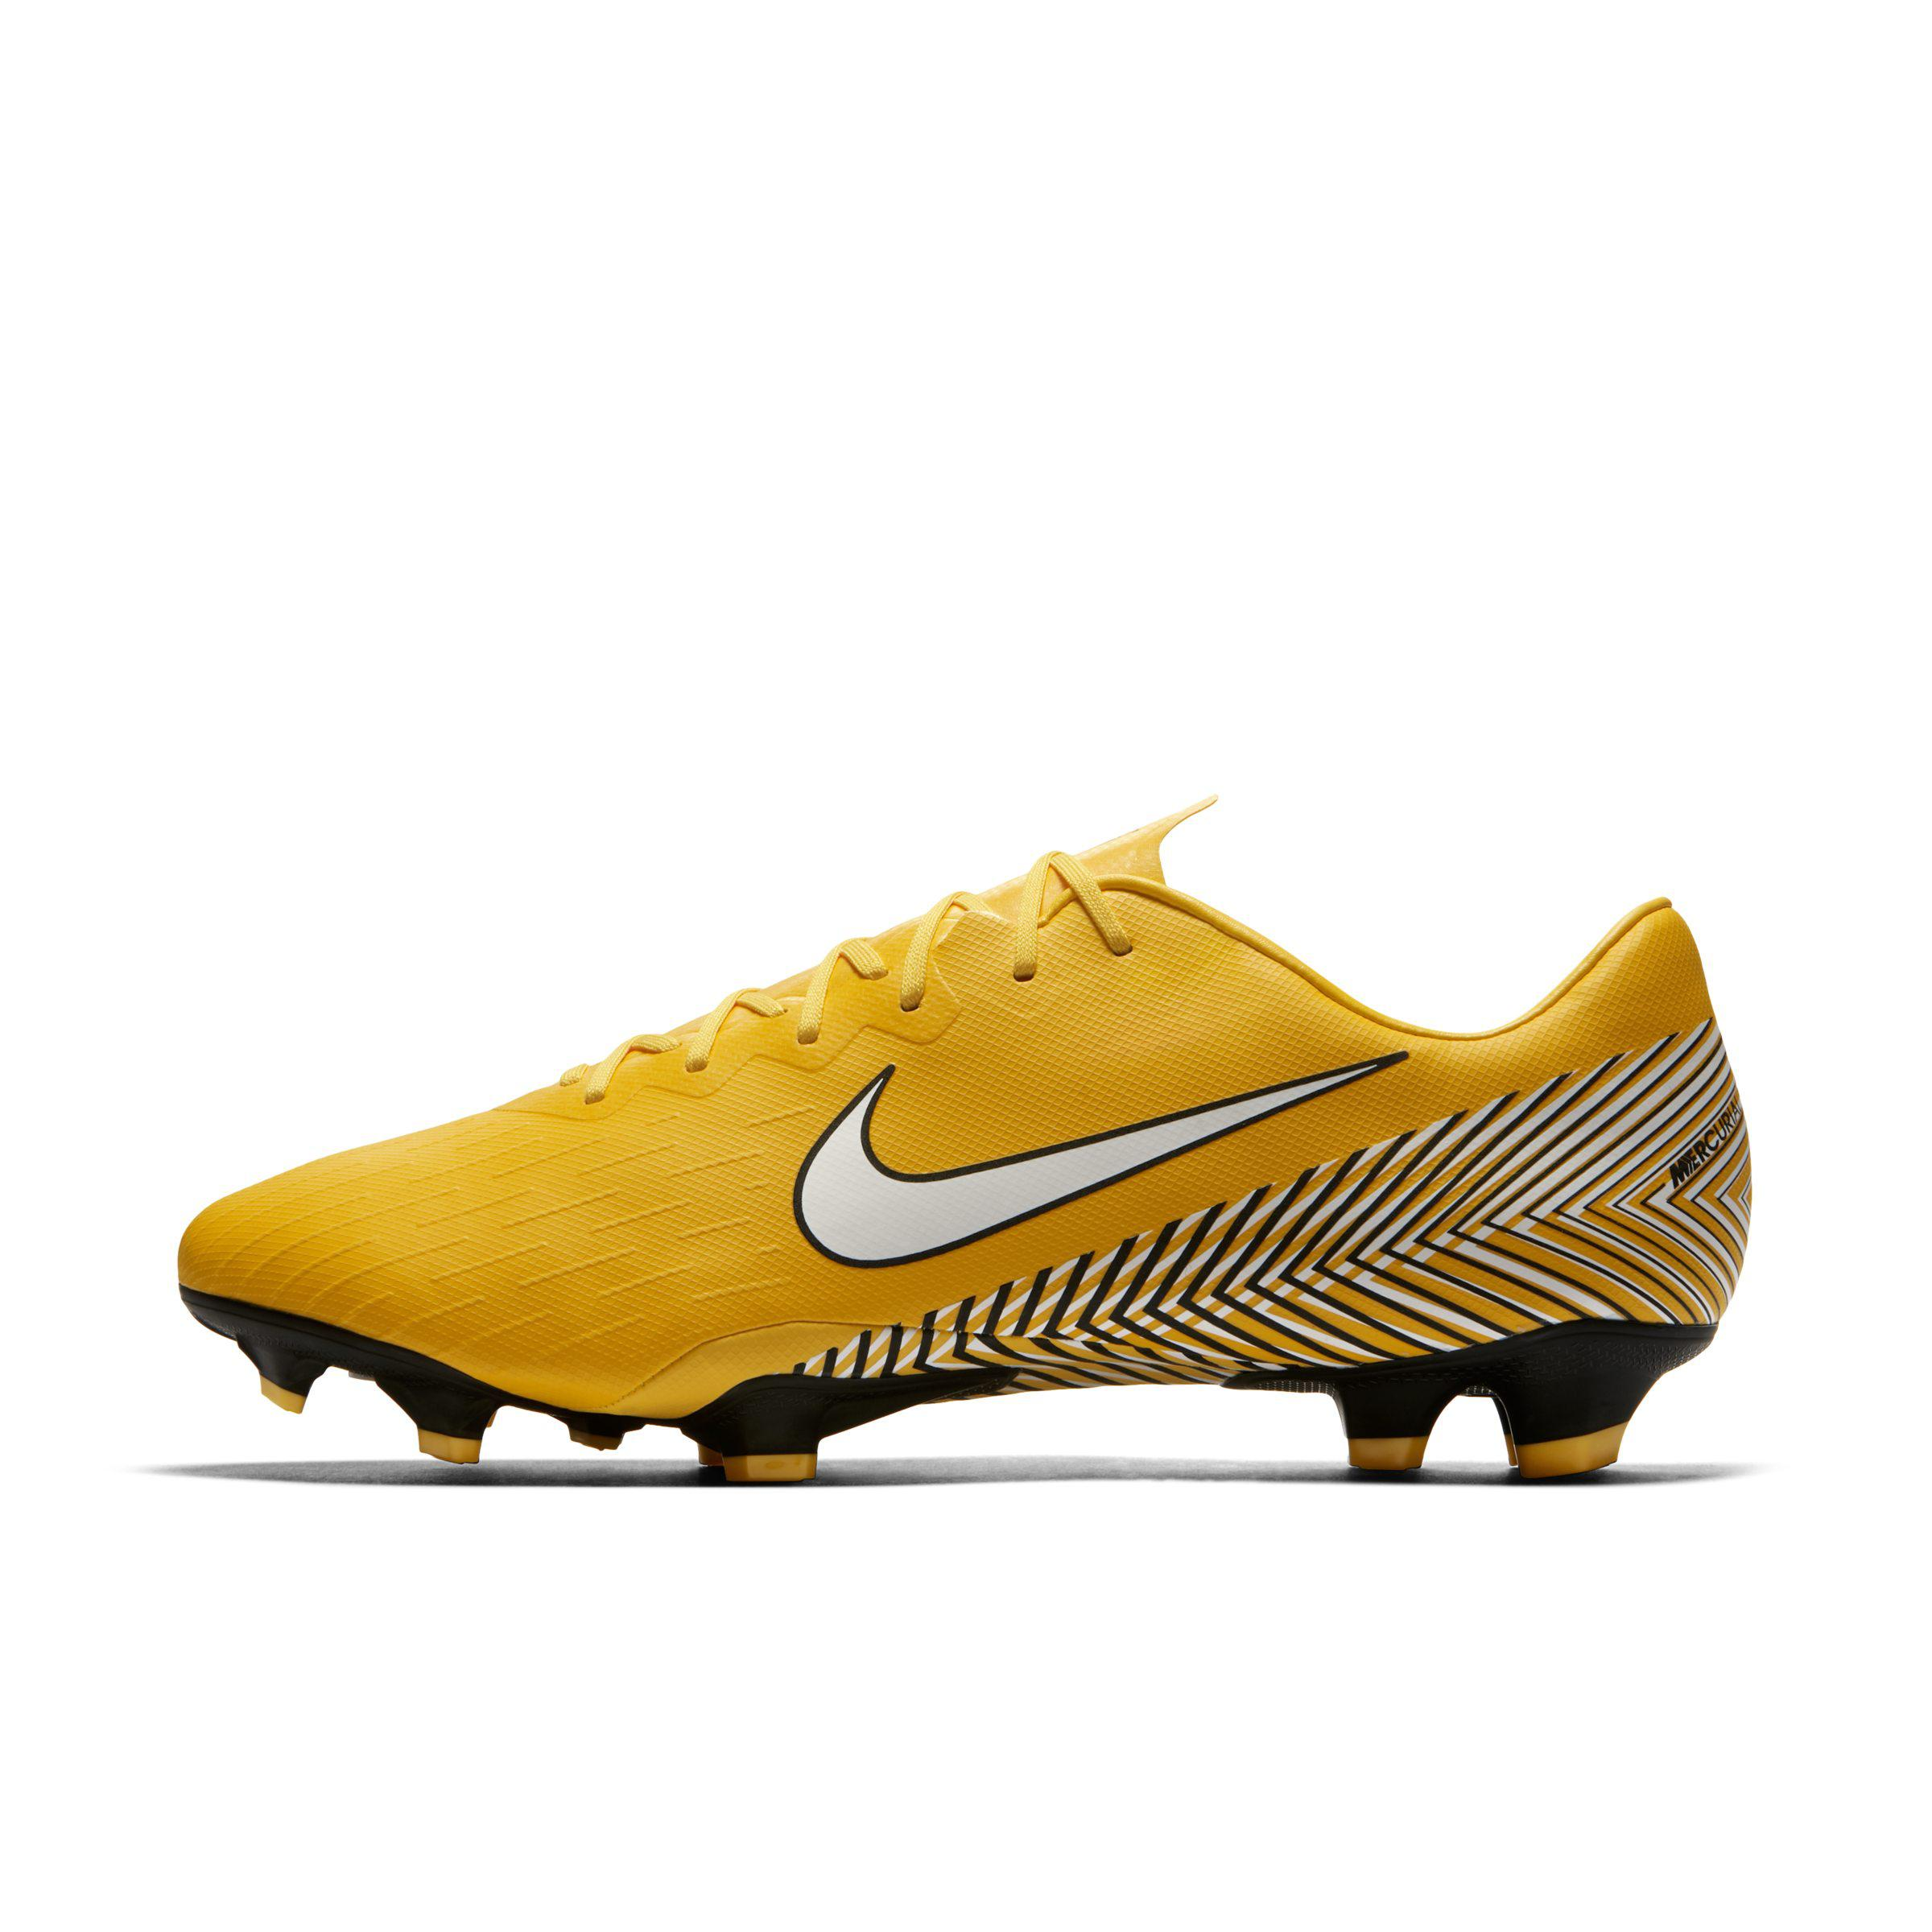 07eb77125 Nike Mercurial Vapor Xii Pro Neymar Jr. Firm-ground Football Boot in ...